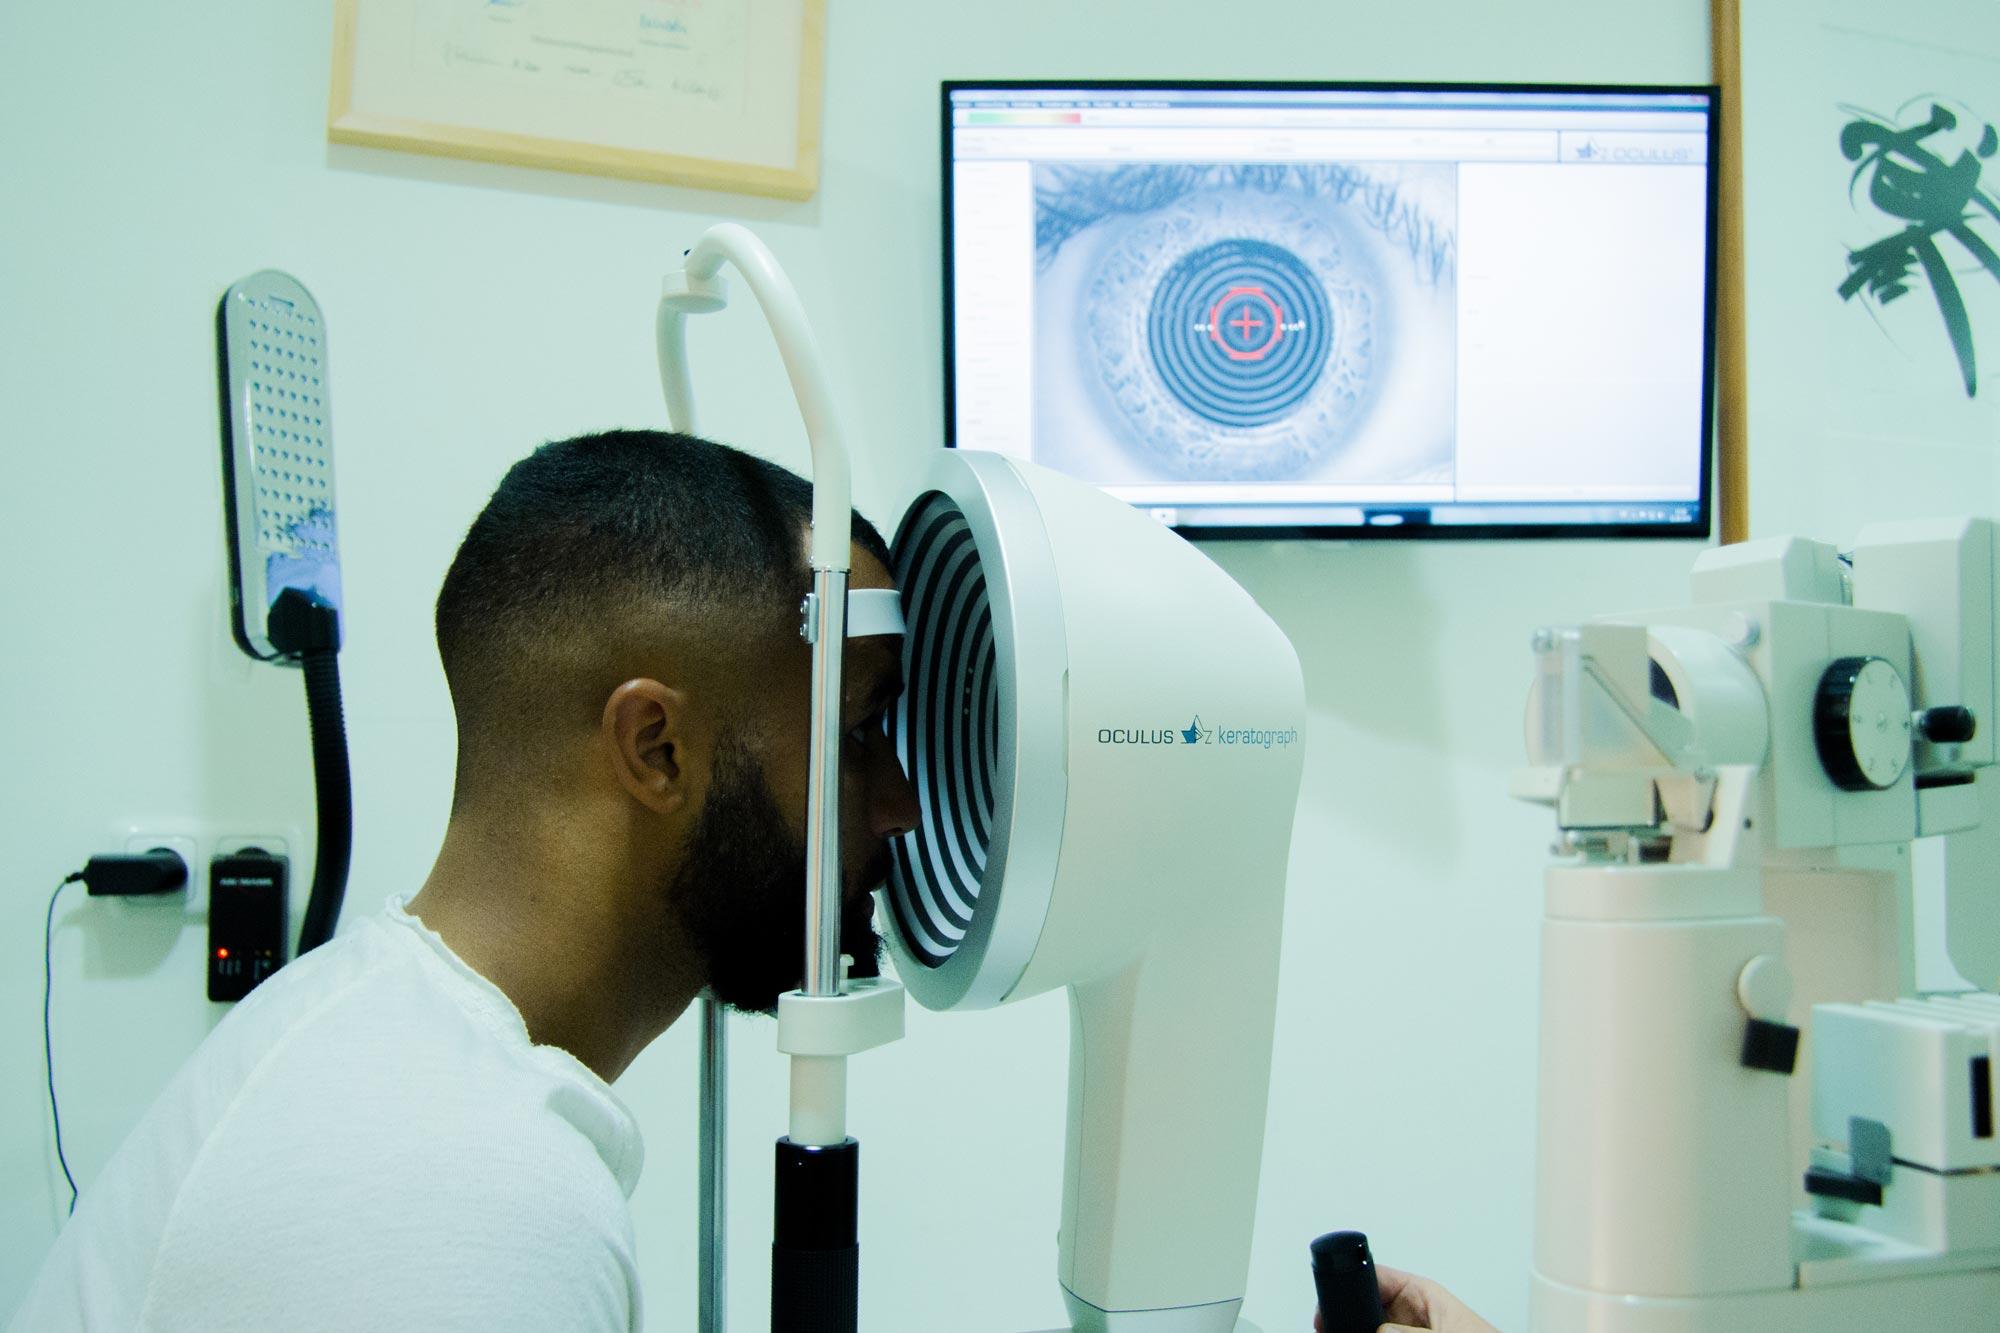 Fußballprofi des FC Hansa Rostock Del Angelo Williams am Oculus Keratographen 5M bei Optik Sagawe Rostock